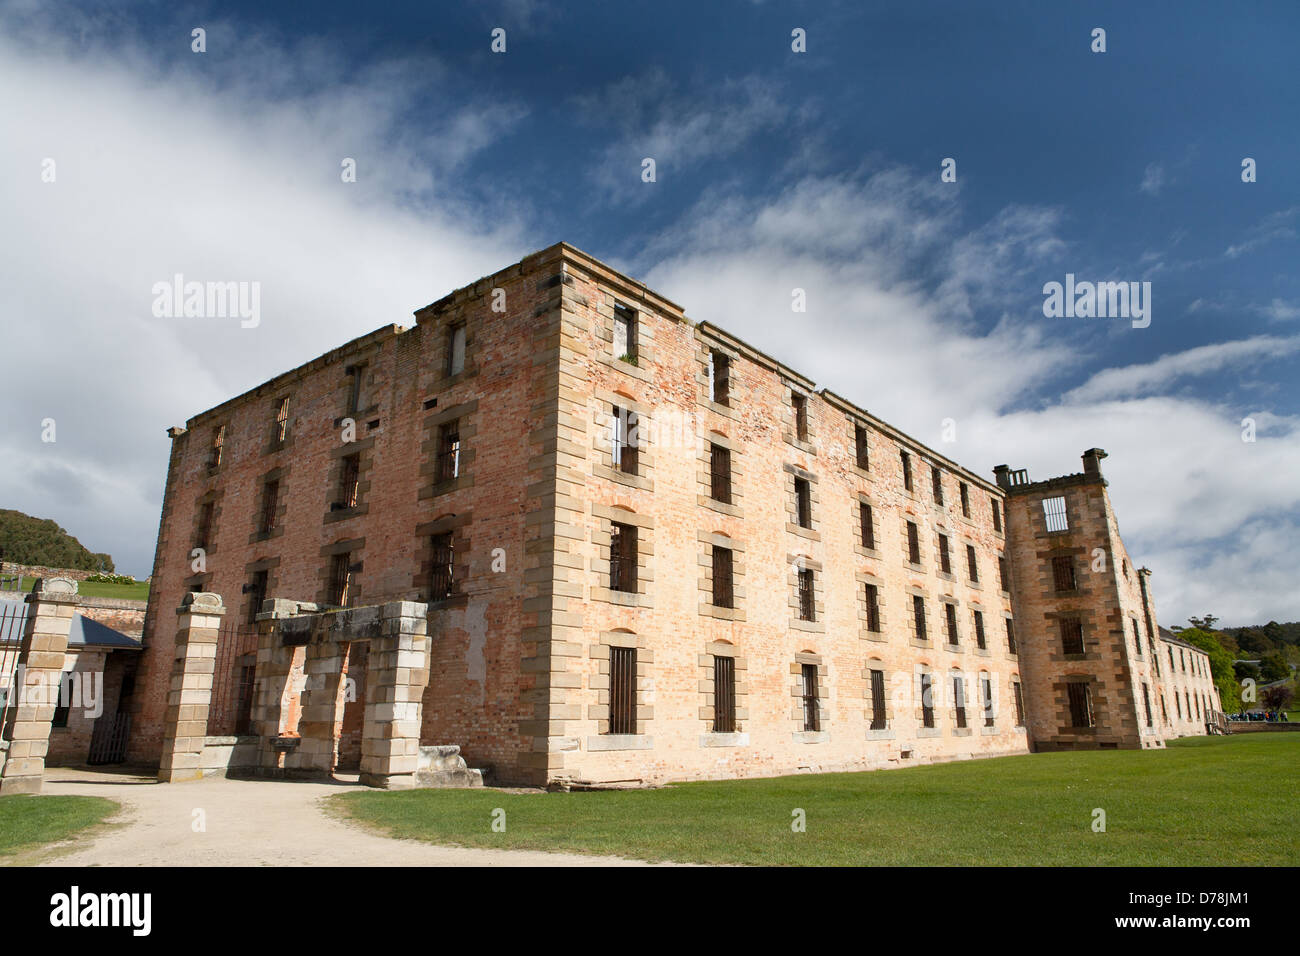 The penitentiary building at Port Arthur in Tasmania, Australia - Stock Image